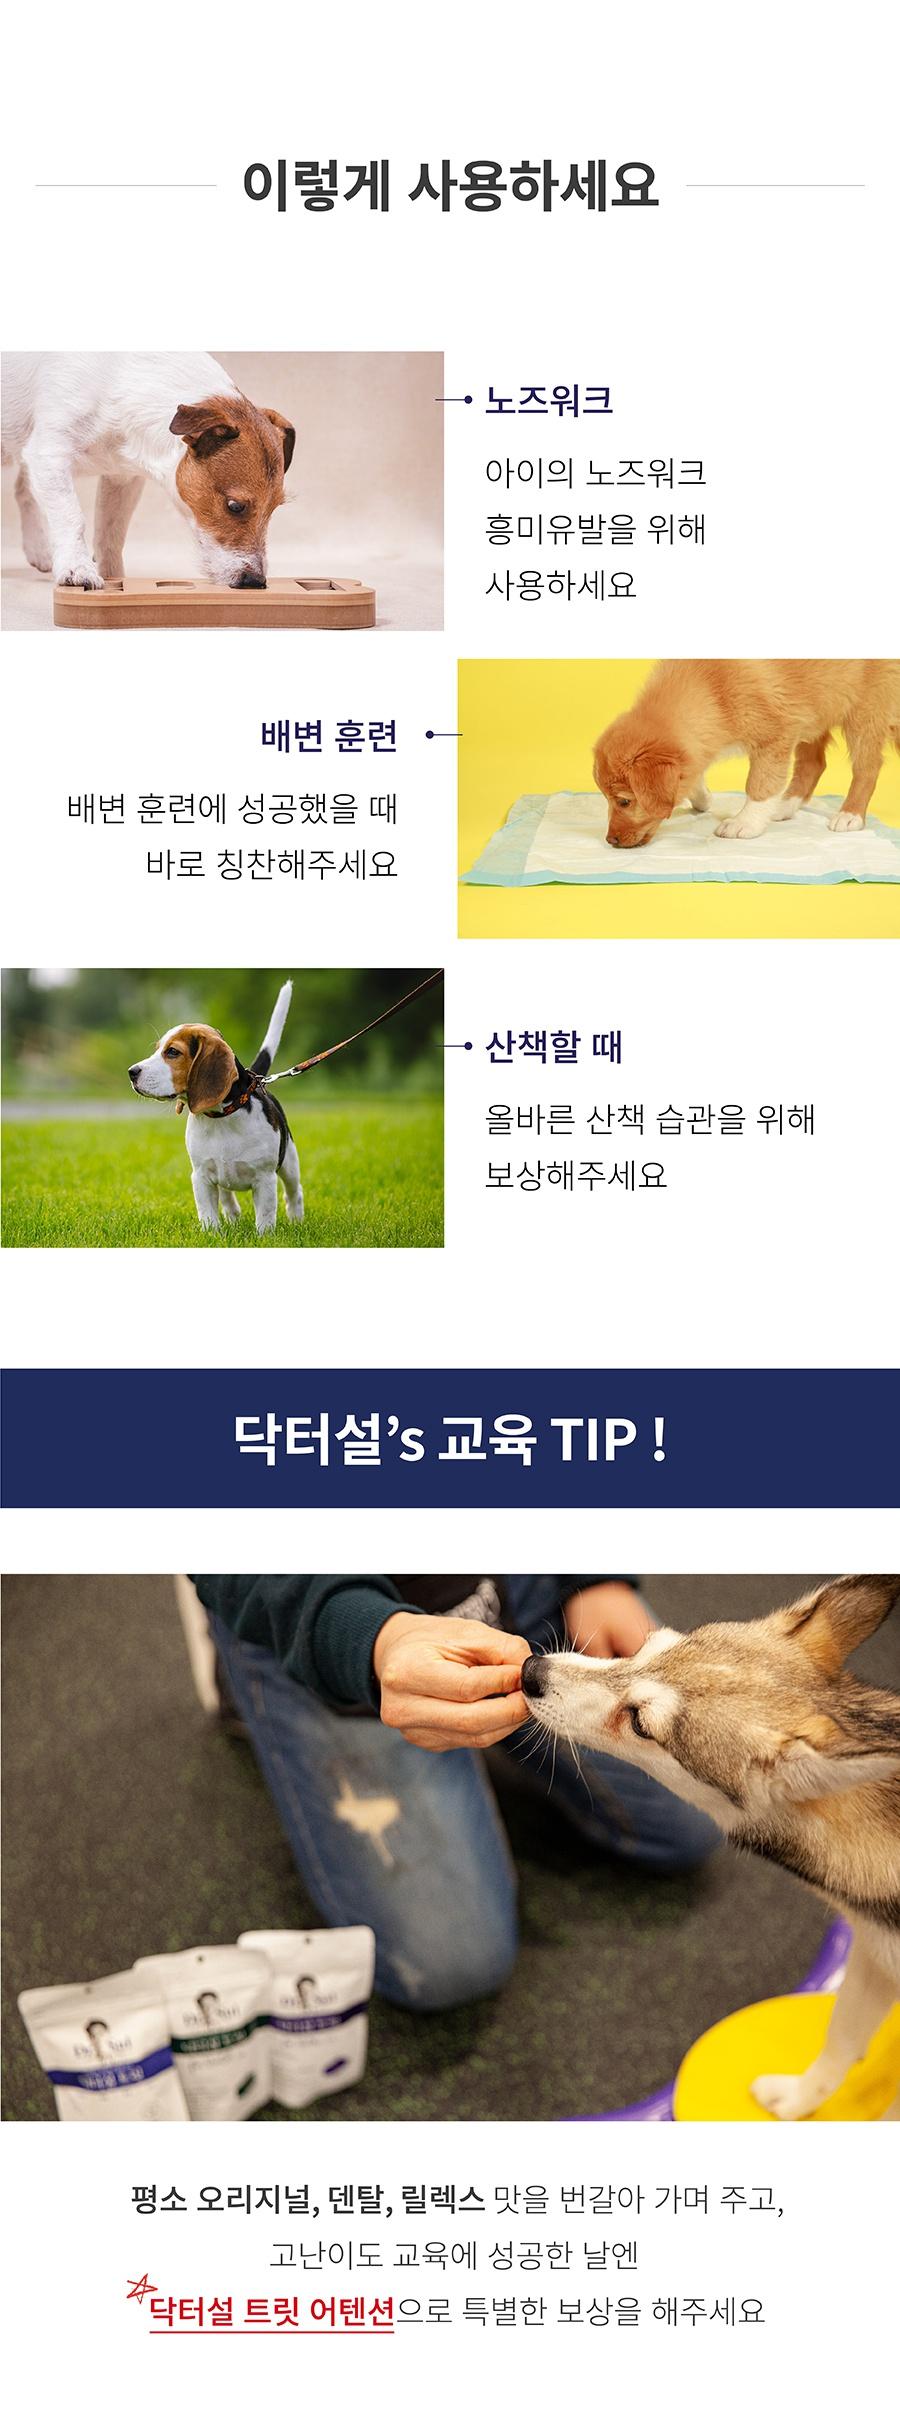 [EVENT] 닥터설 트릿-상품이미지-6